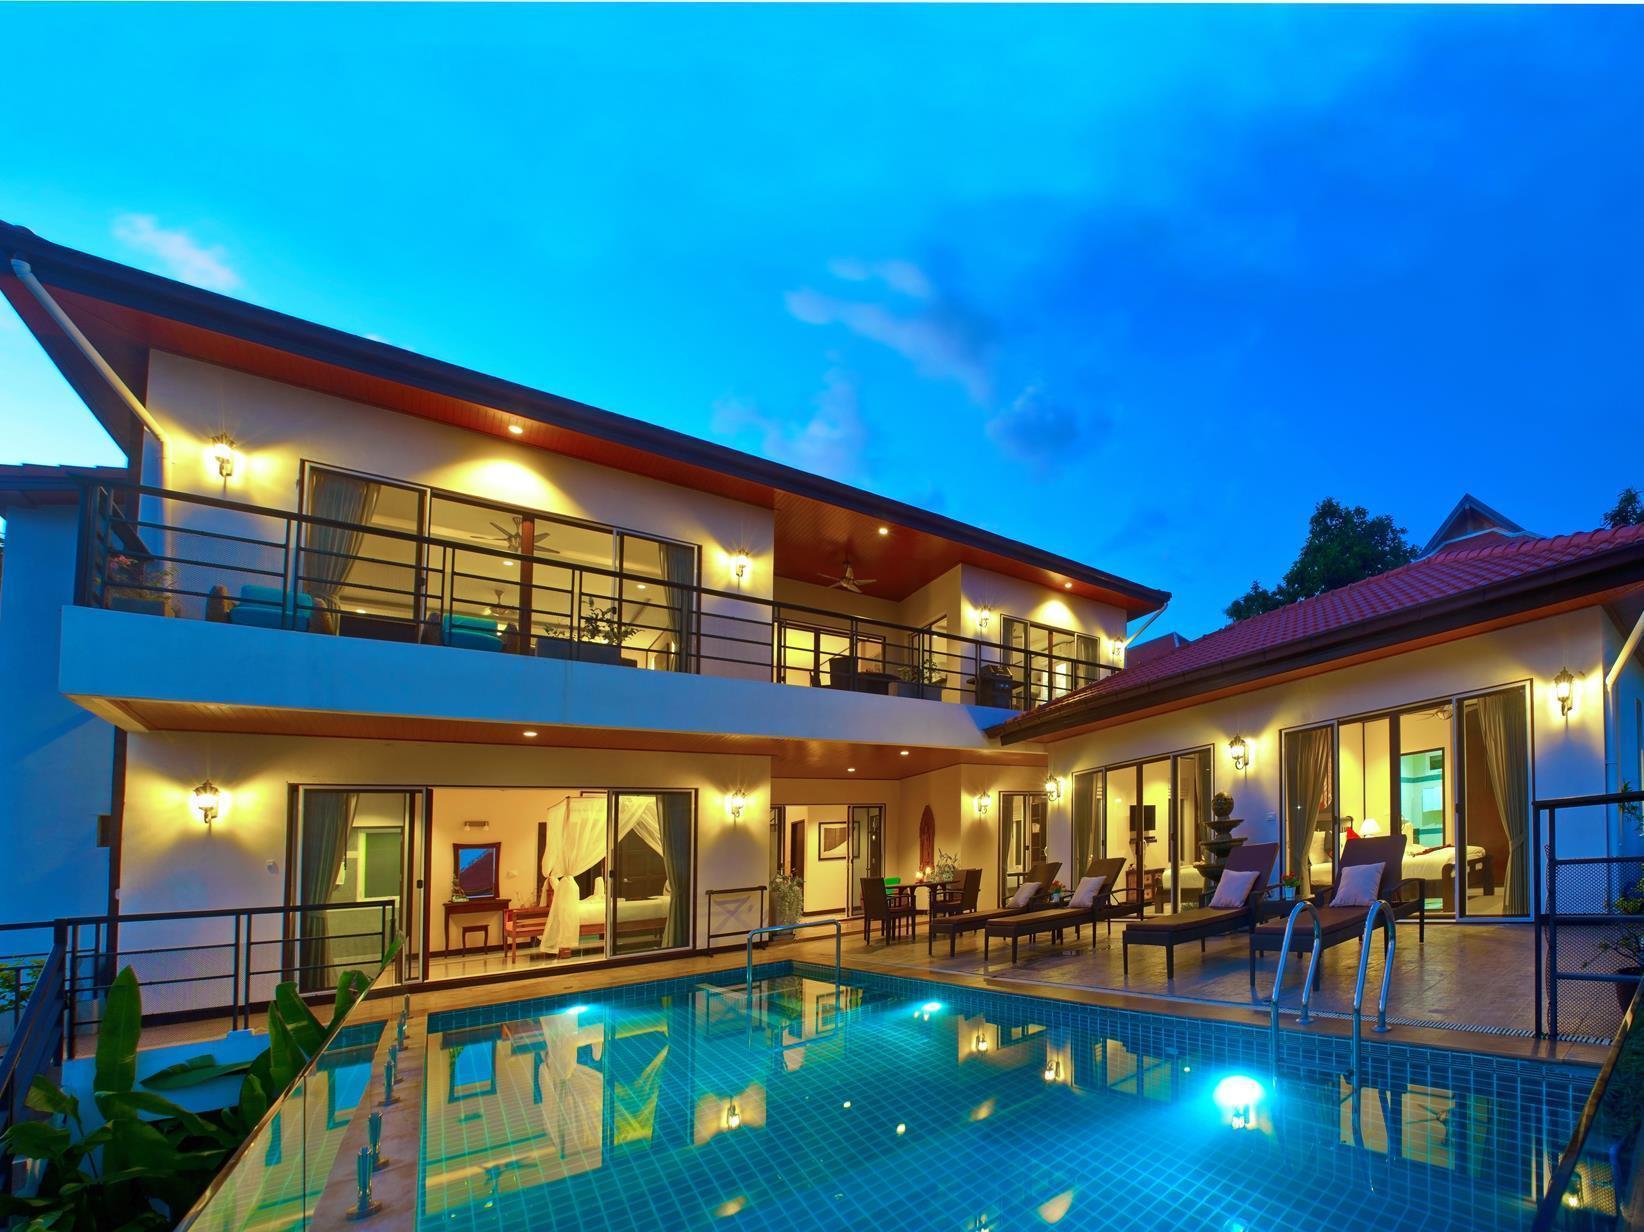 Sunrise Seaview Villa ซันไรซ์ ซีวิว วิลลา